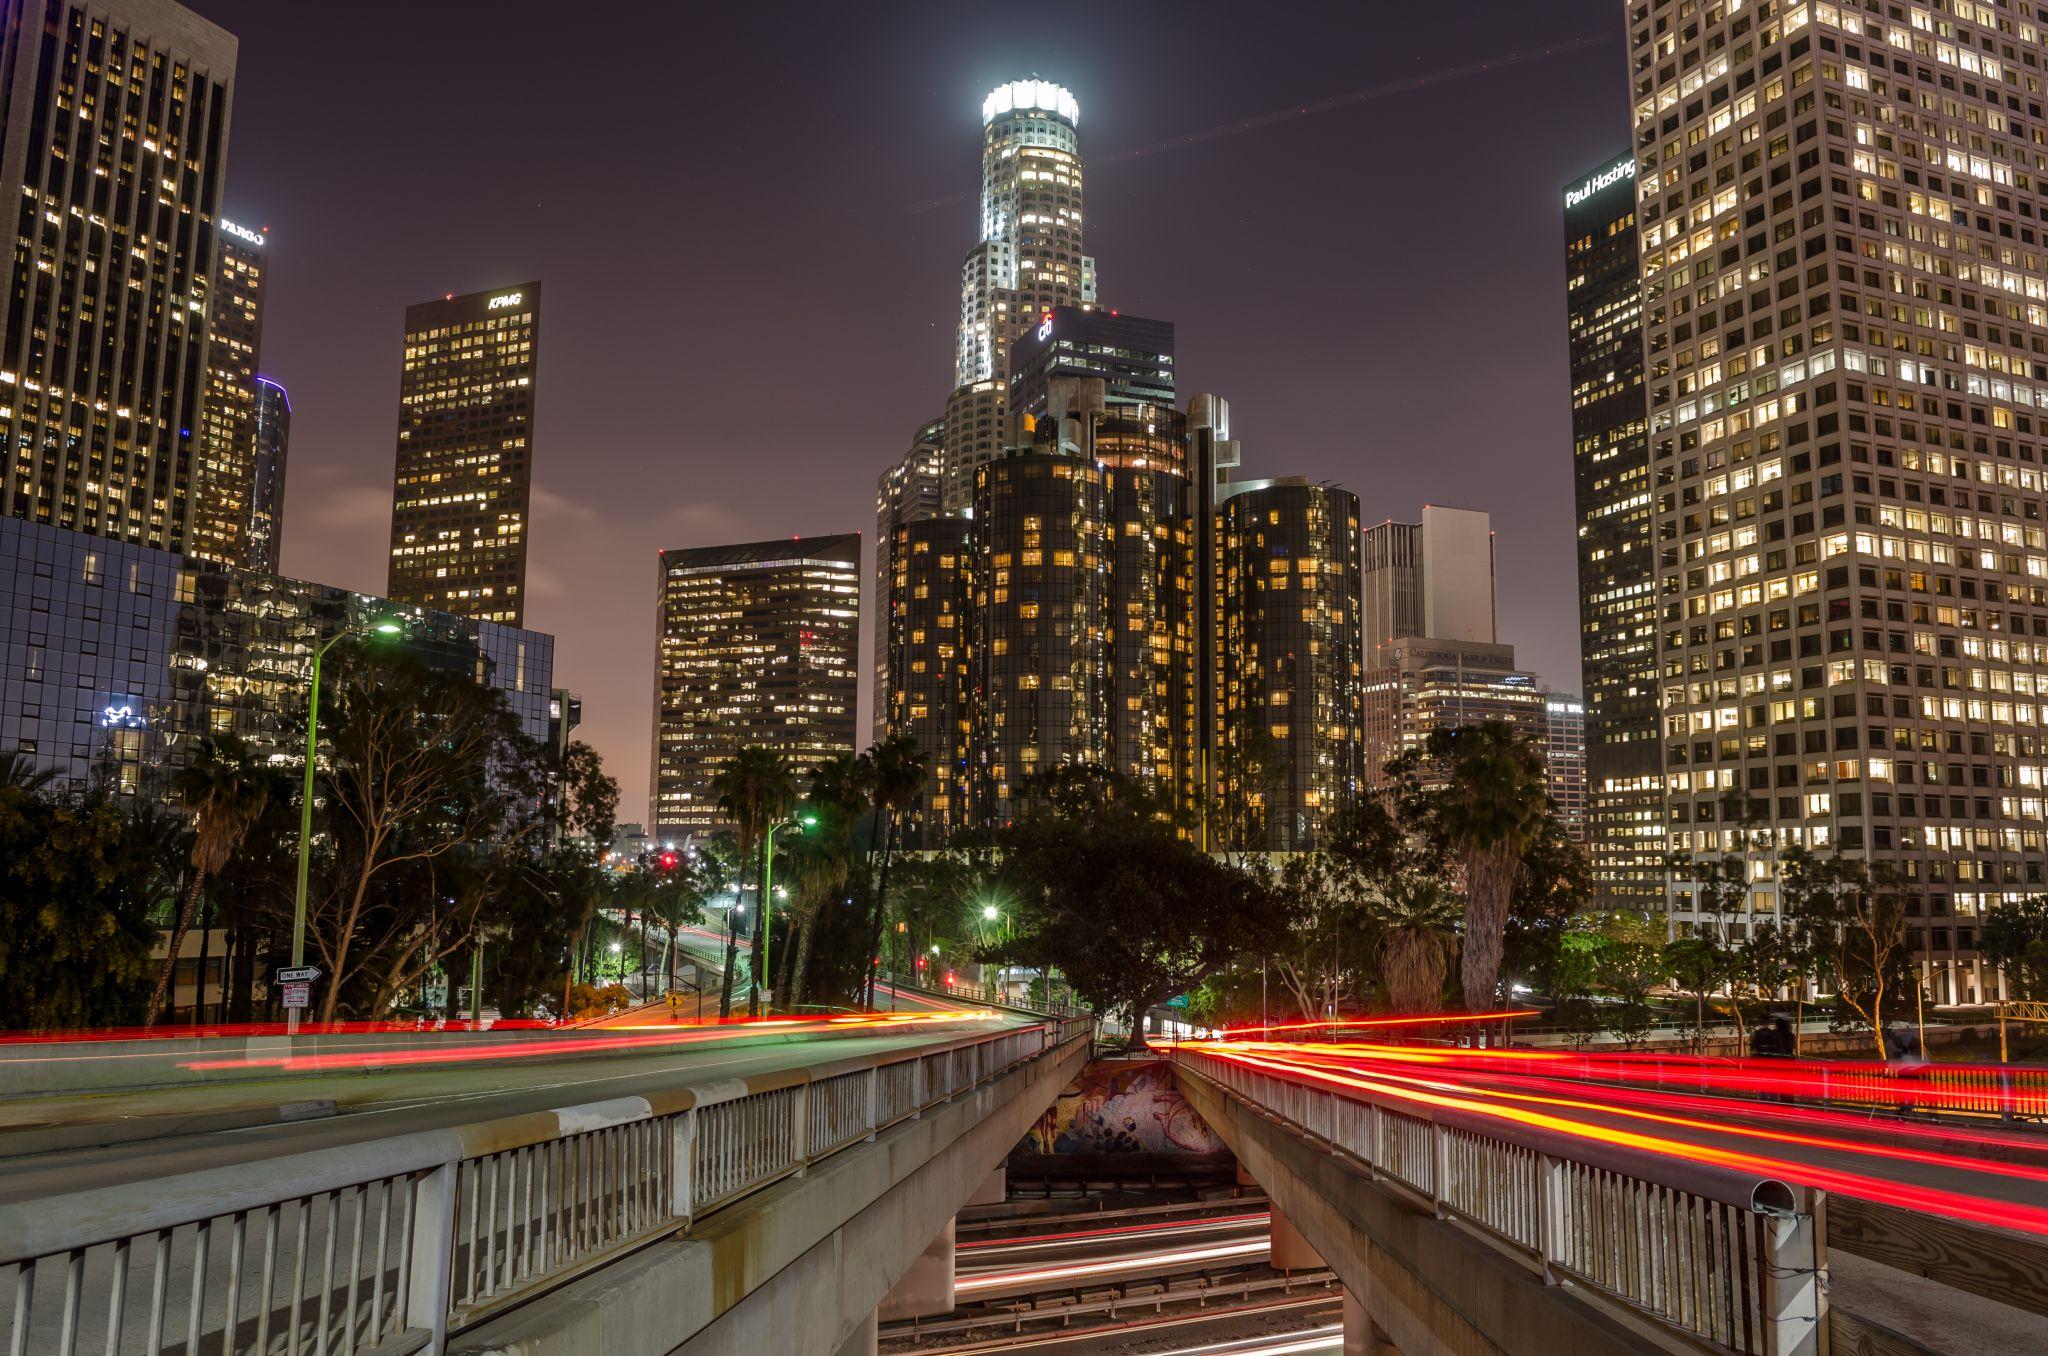 4th Street, Los Angeles, USA